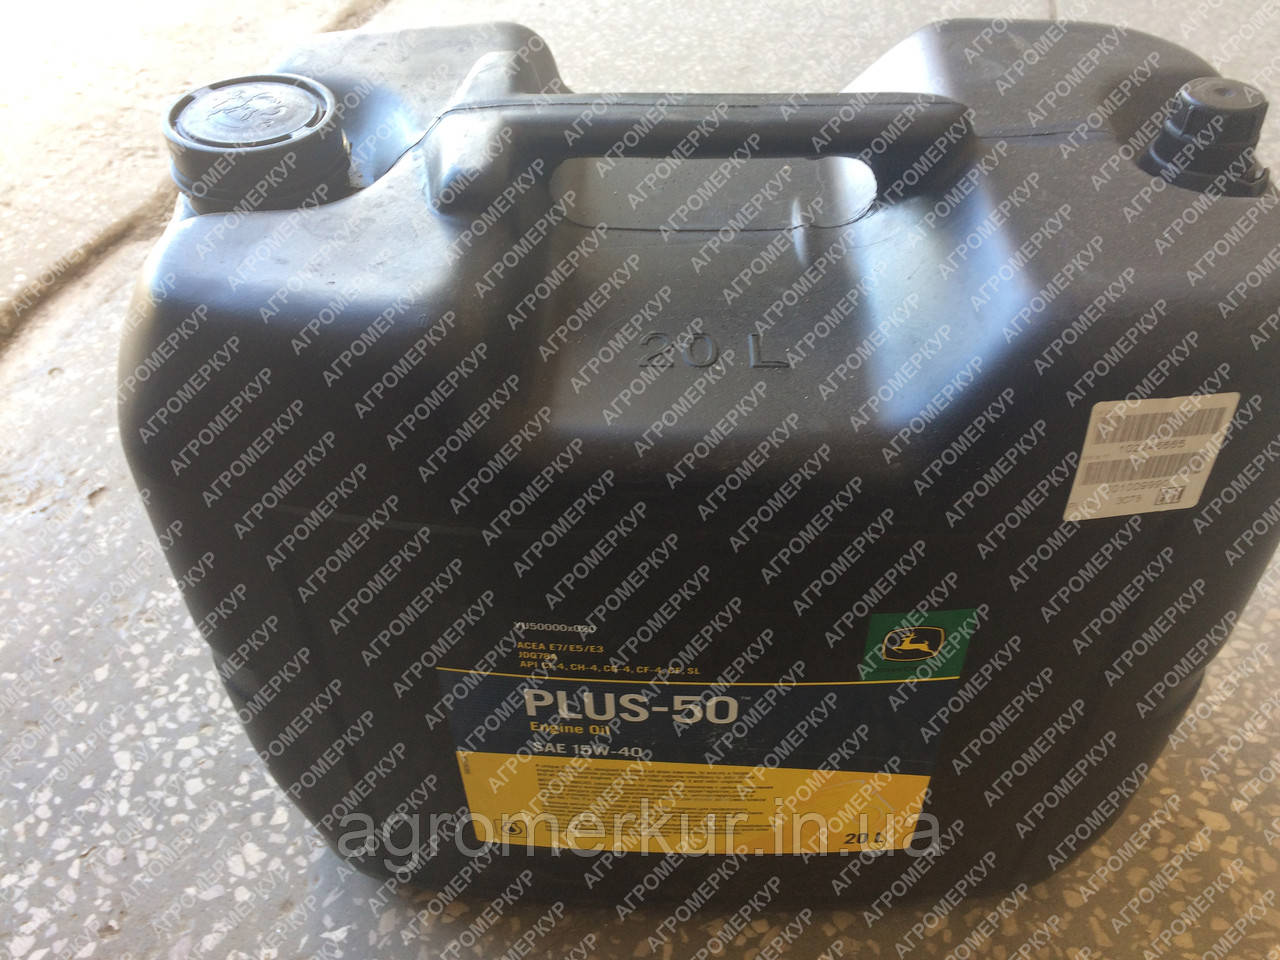 Масло PLU550 John Deere